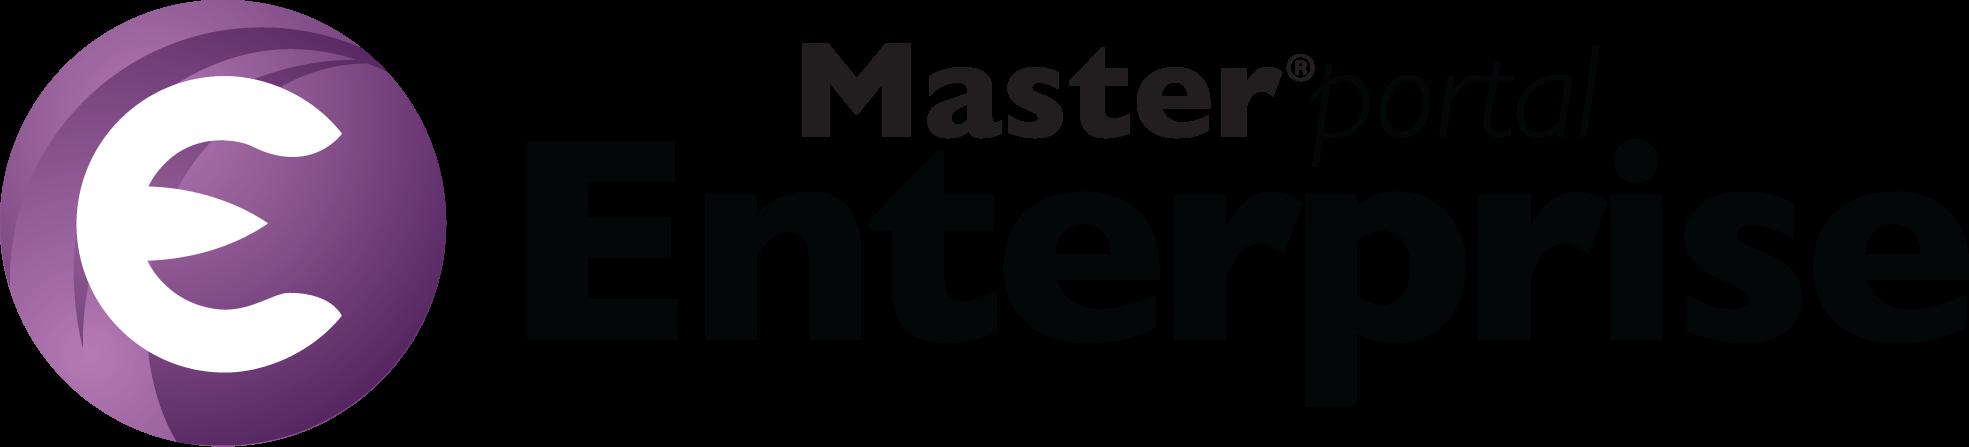 Master portal Enterprise